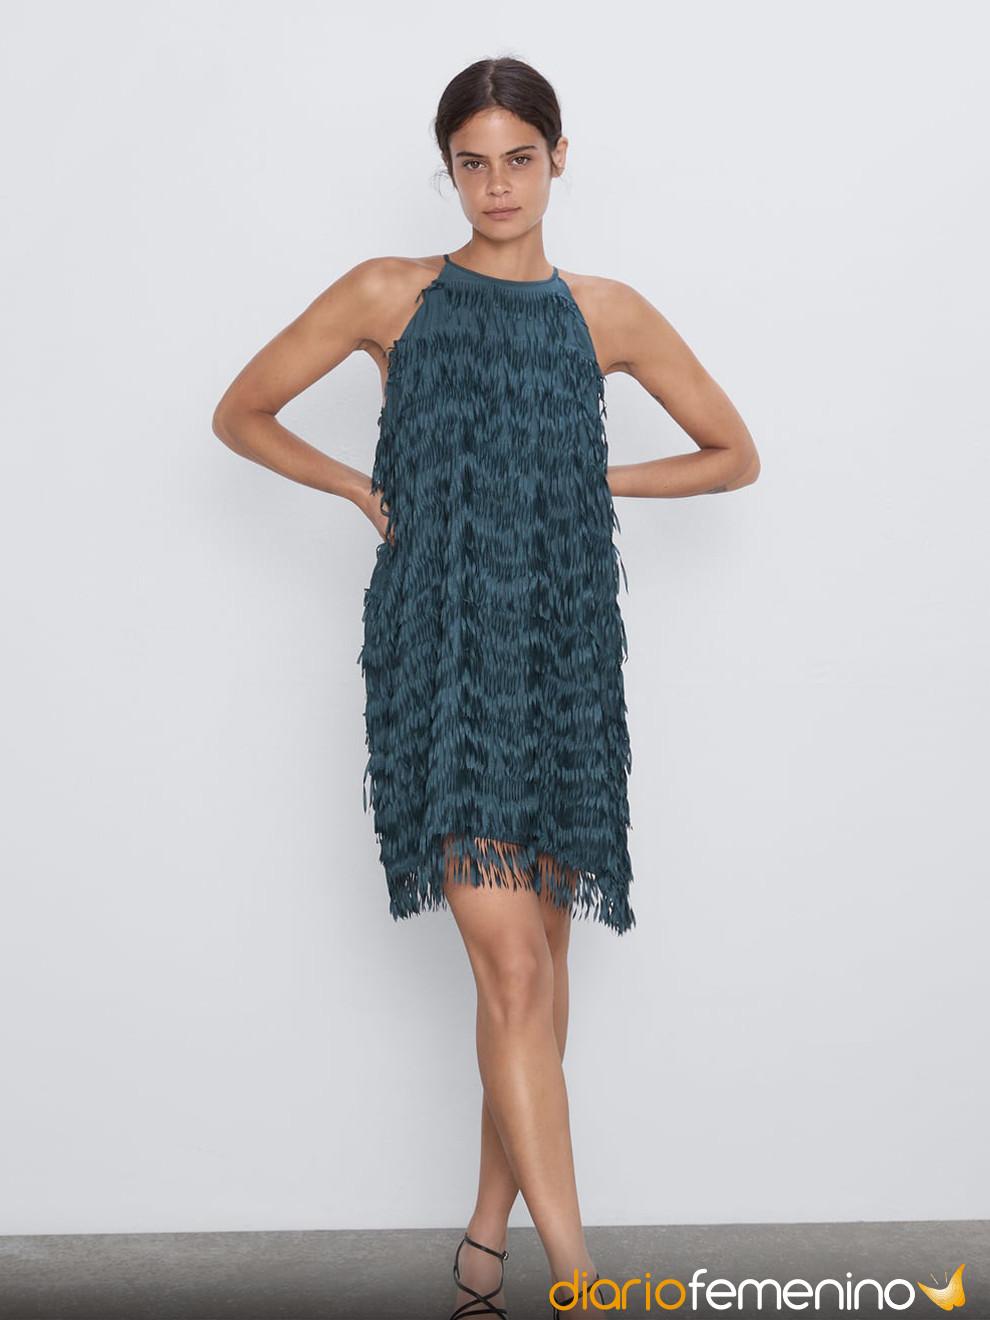 Divertido Vestido De Flecos De Zara Para Nochevieja 2019 2020